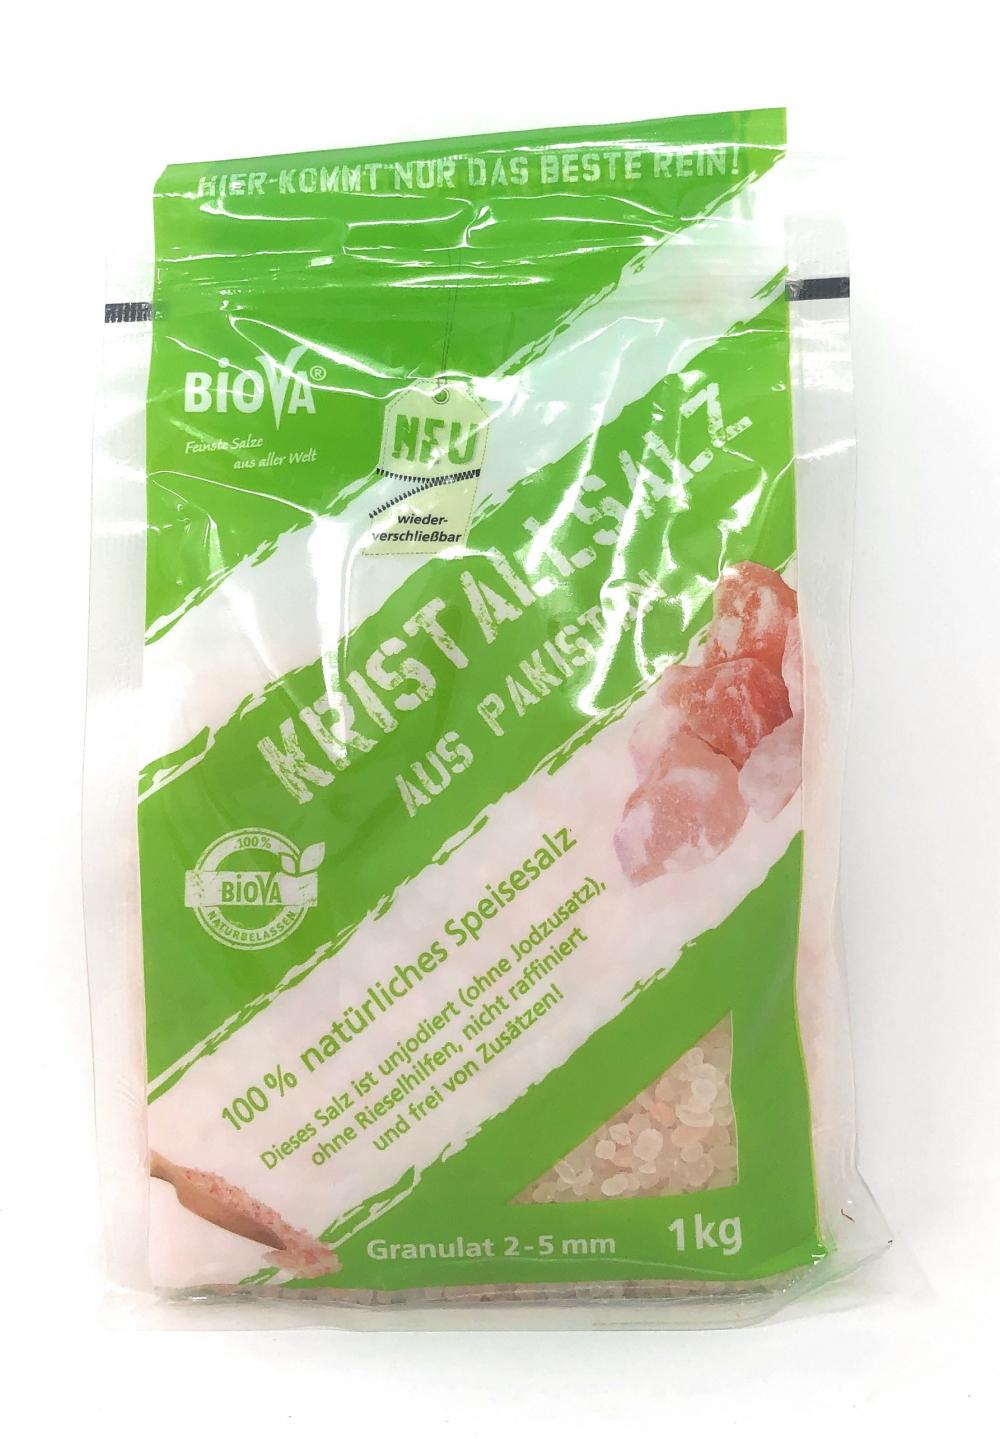 Biova Gourmetsalz Kristallsalz aus Pakistan (Salt Range) Granulat 2-5mm 1kg